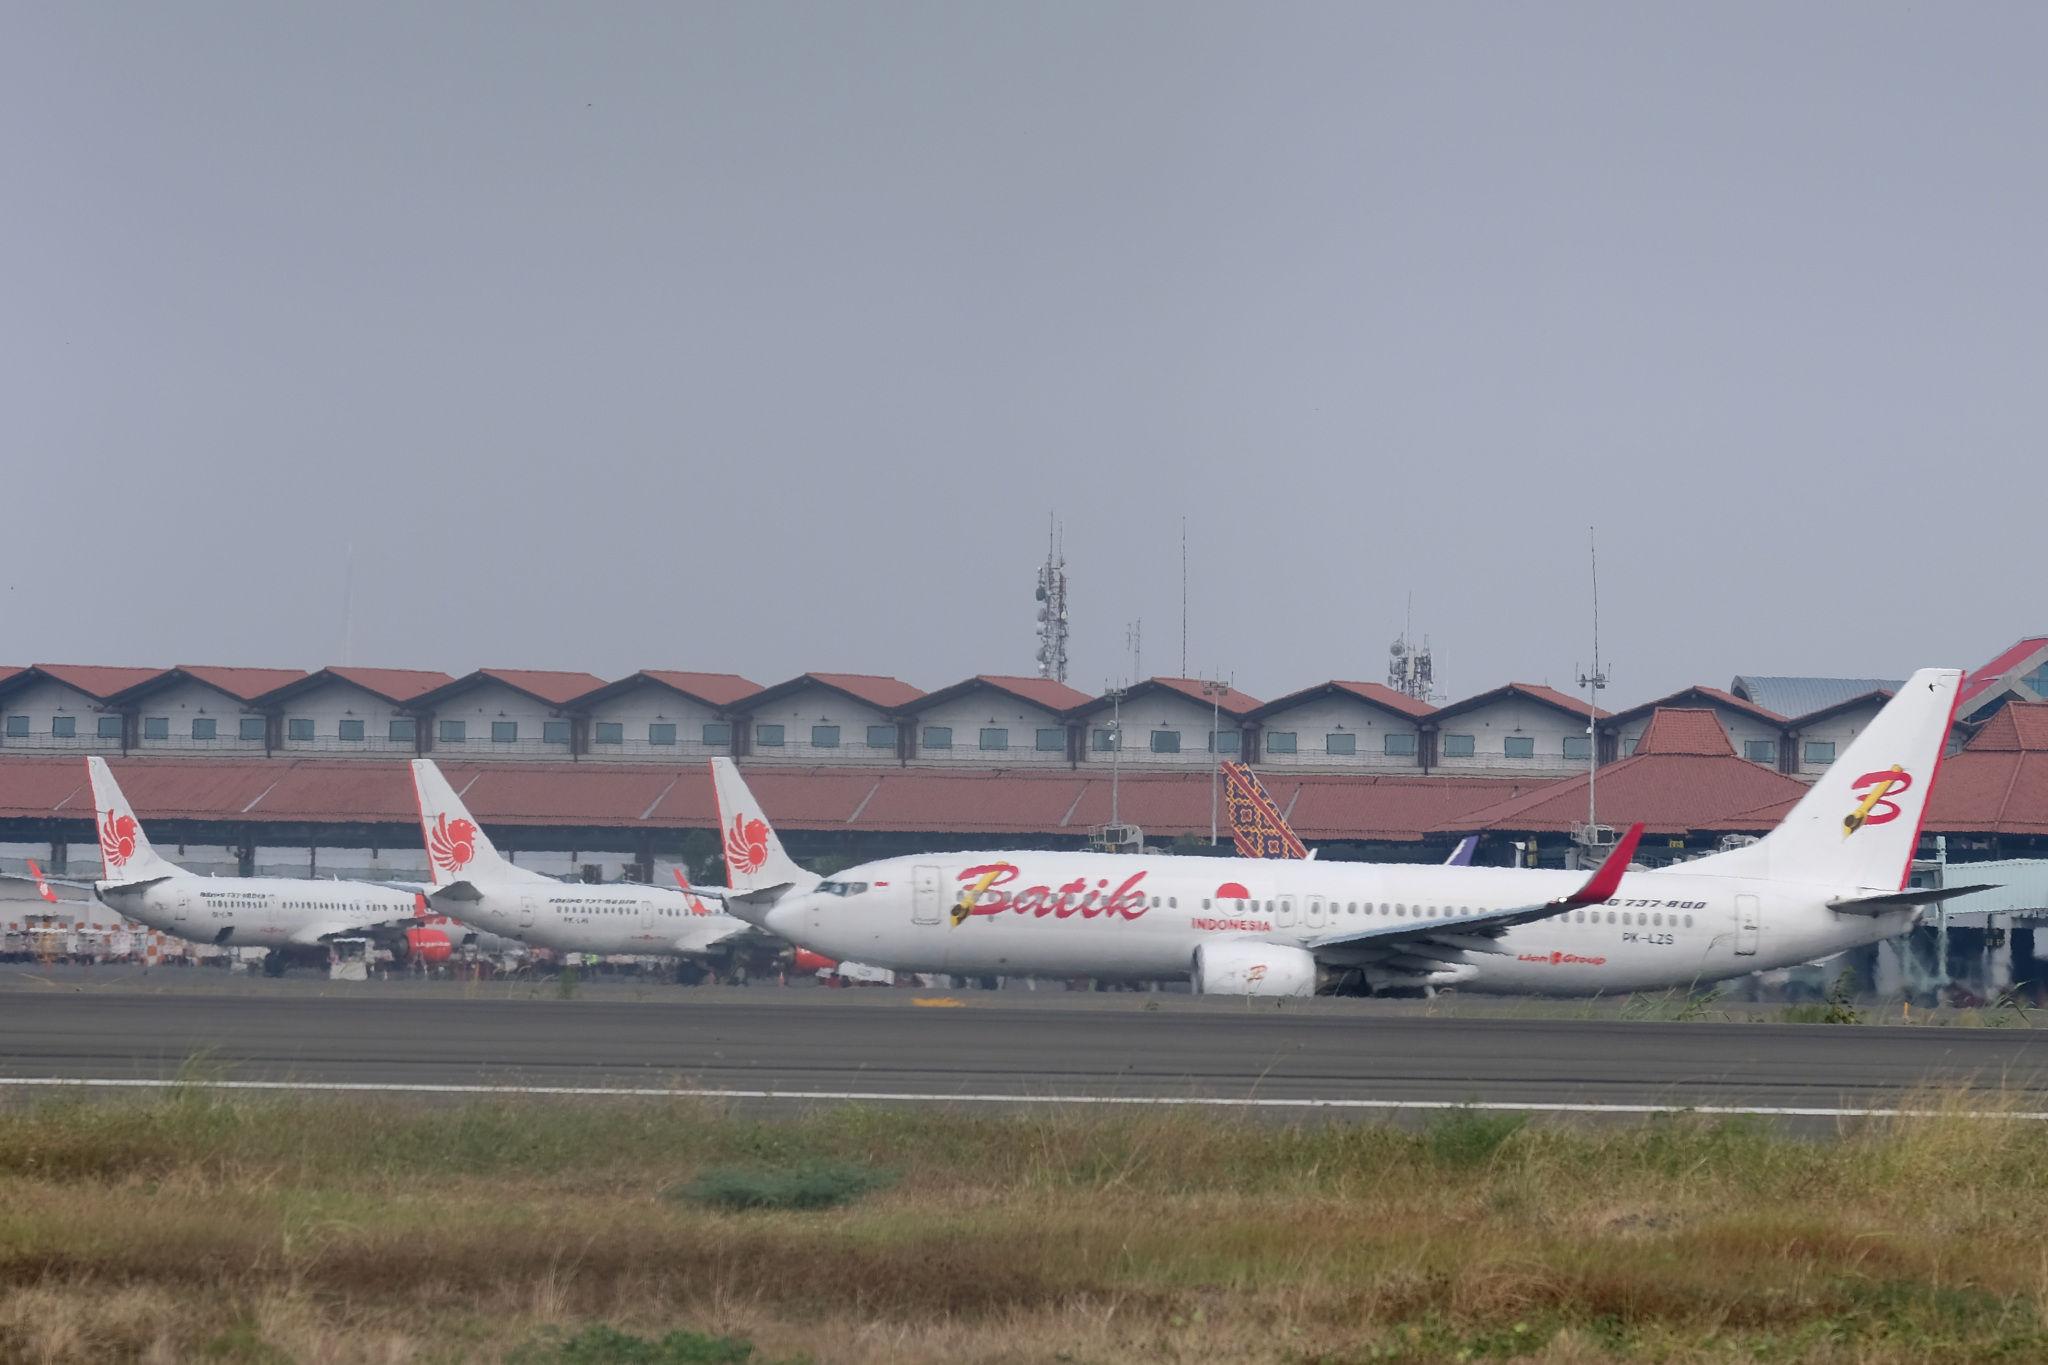 Batik Air Jelaskan Penyebab Pesawat Mendarat Darurat di Bandara Kualanamu